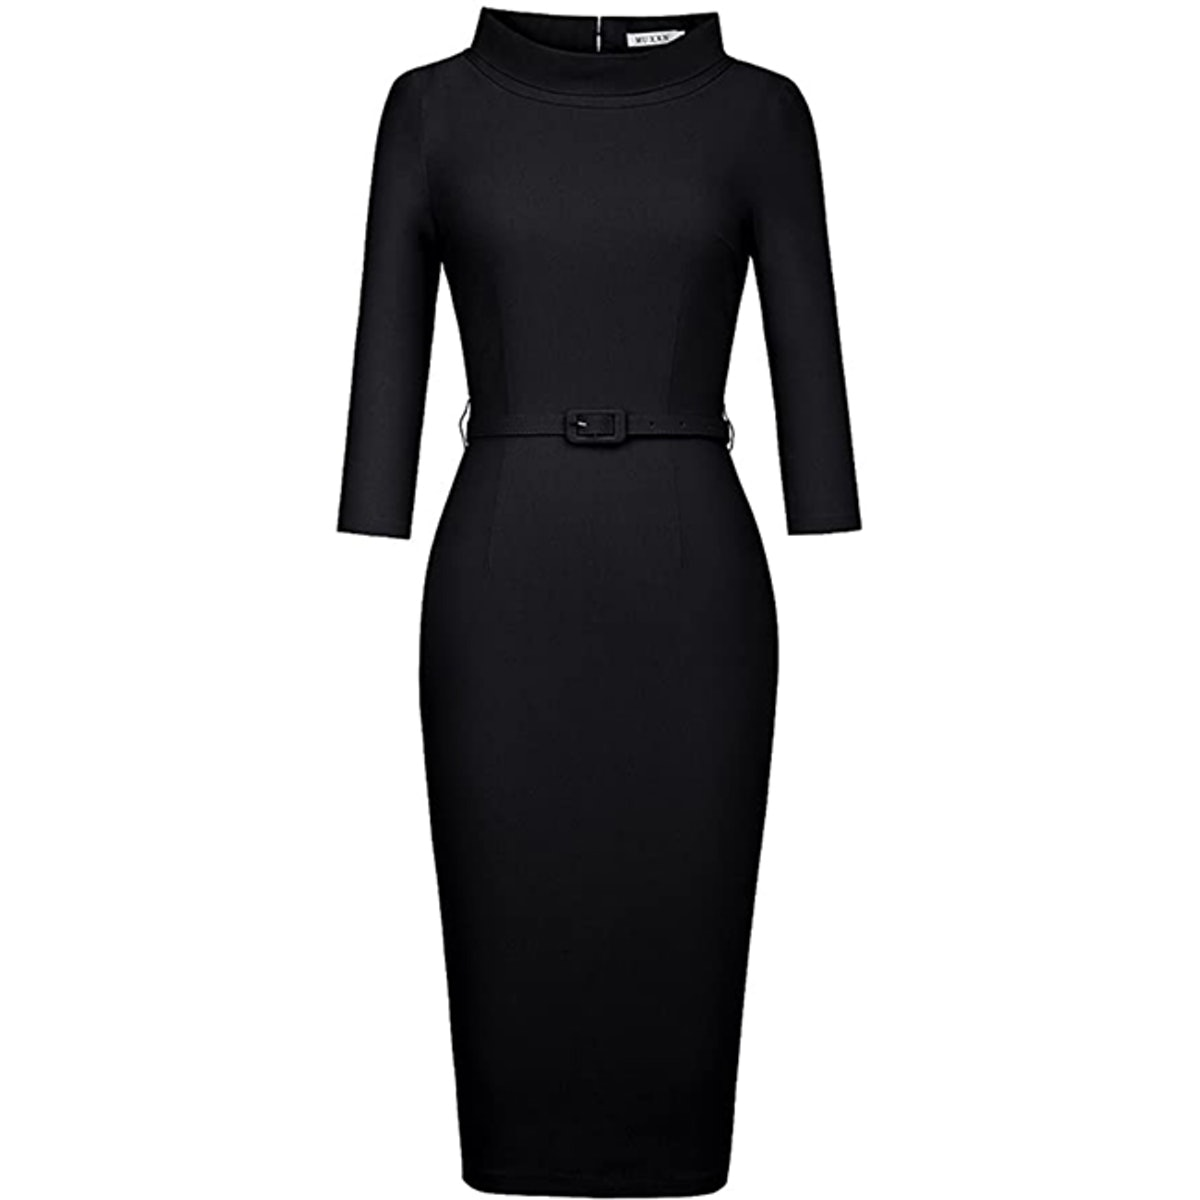 MUXXN 3/4 Sleeve Collared Dress